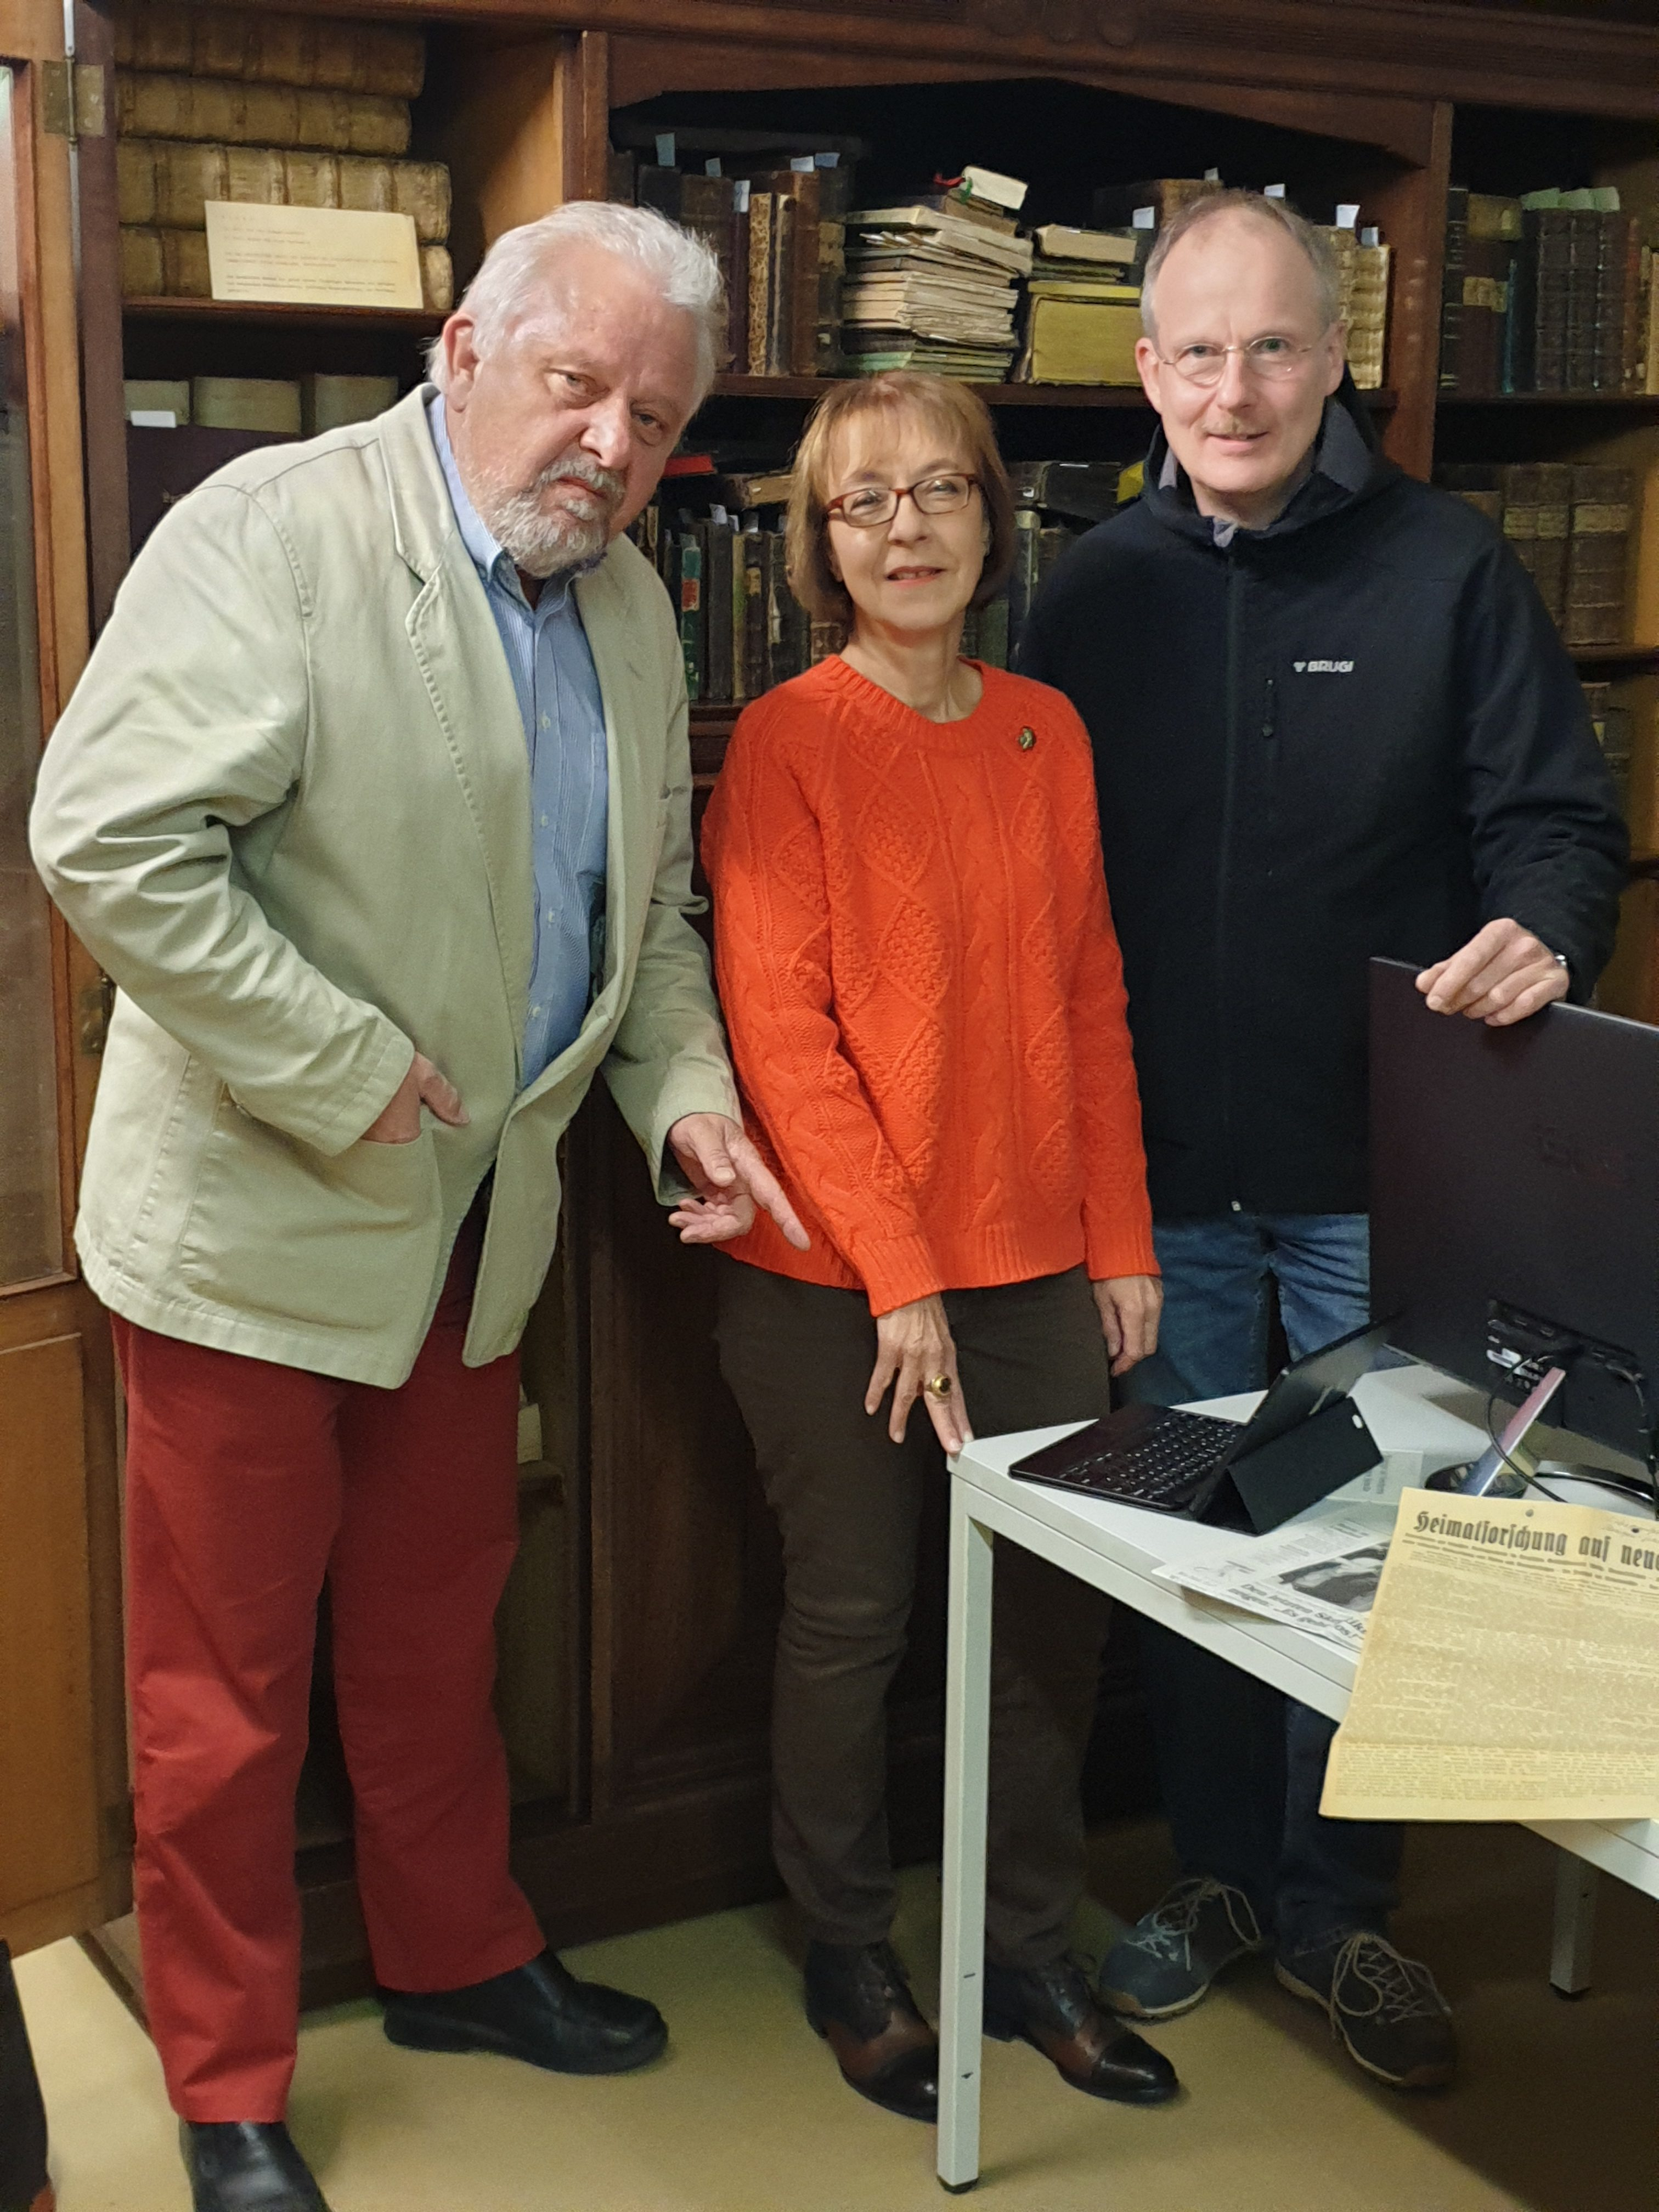 Thomas Wintgen, Marita Bahr, Volker Ernst